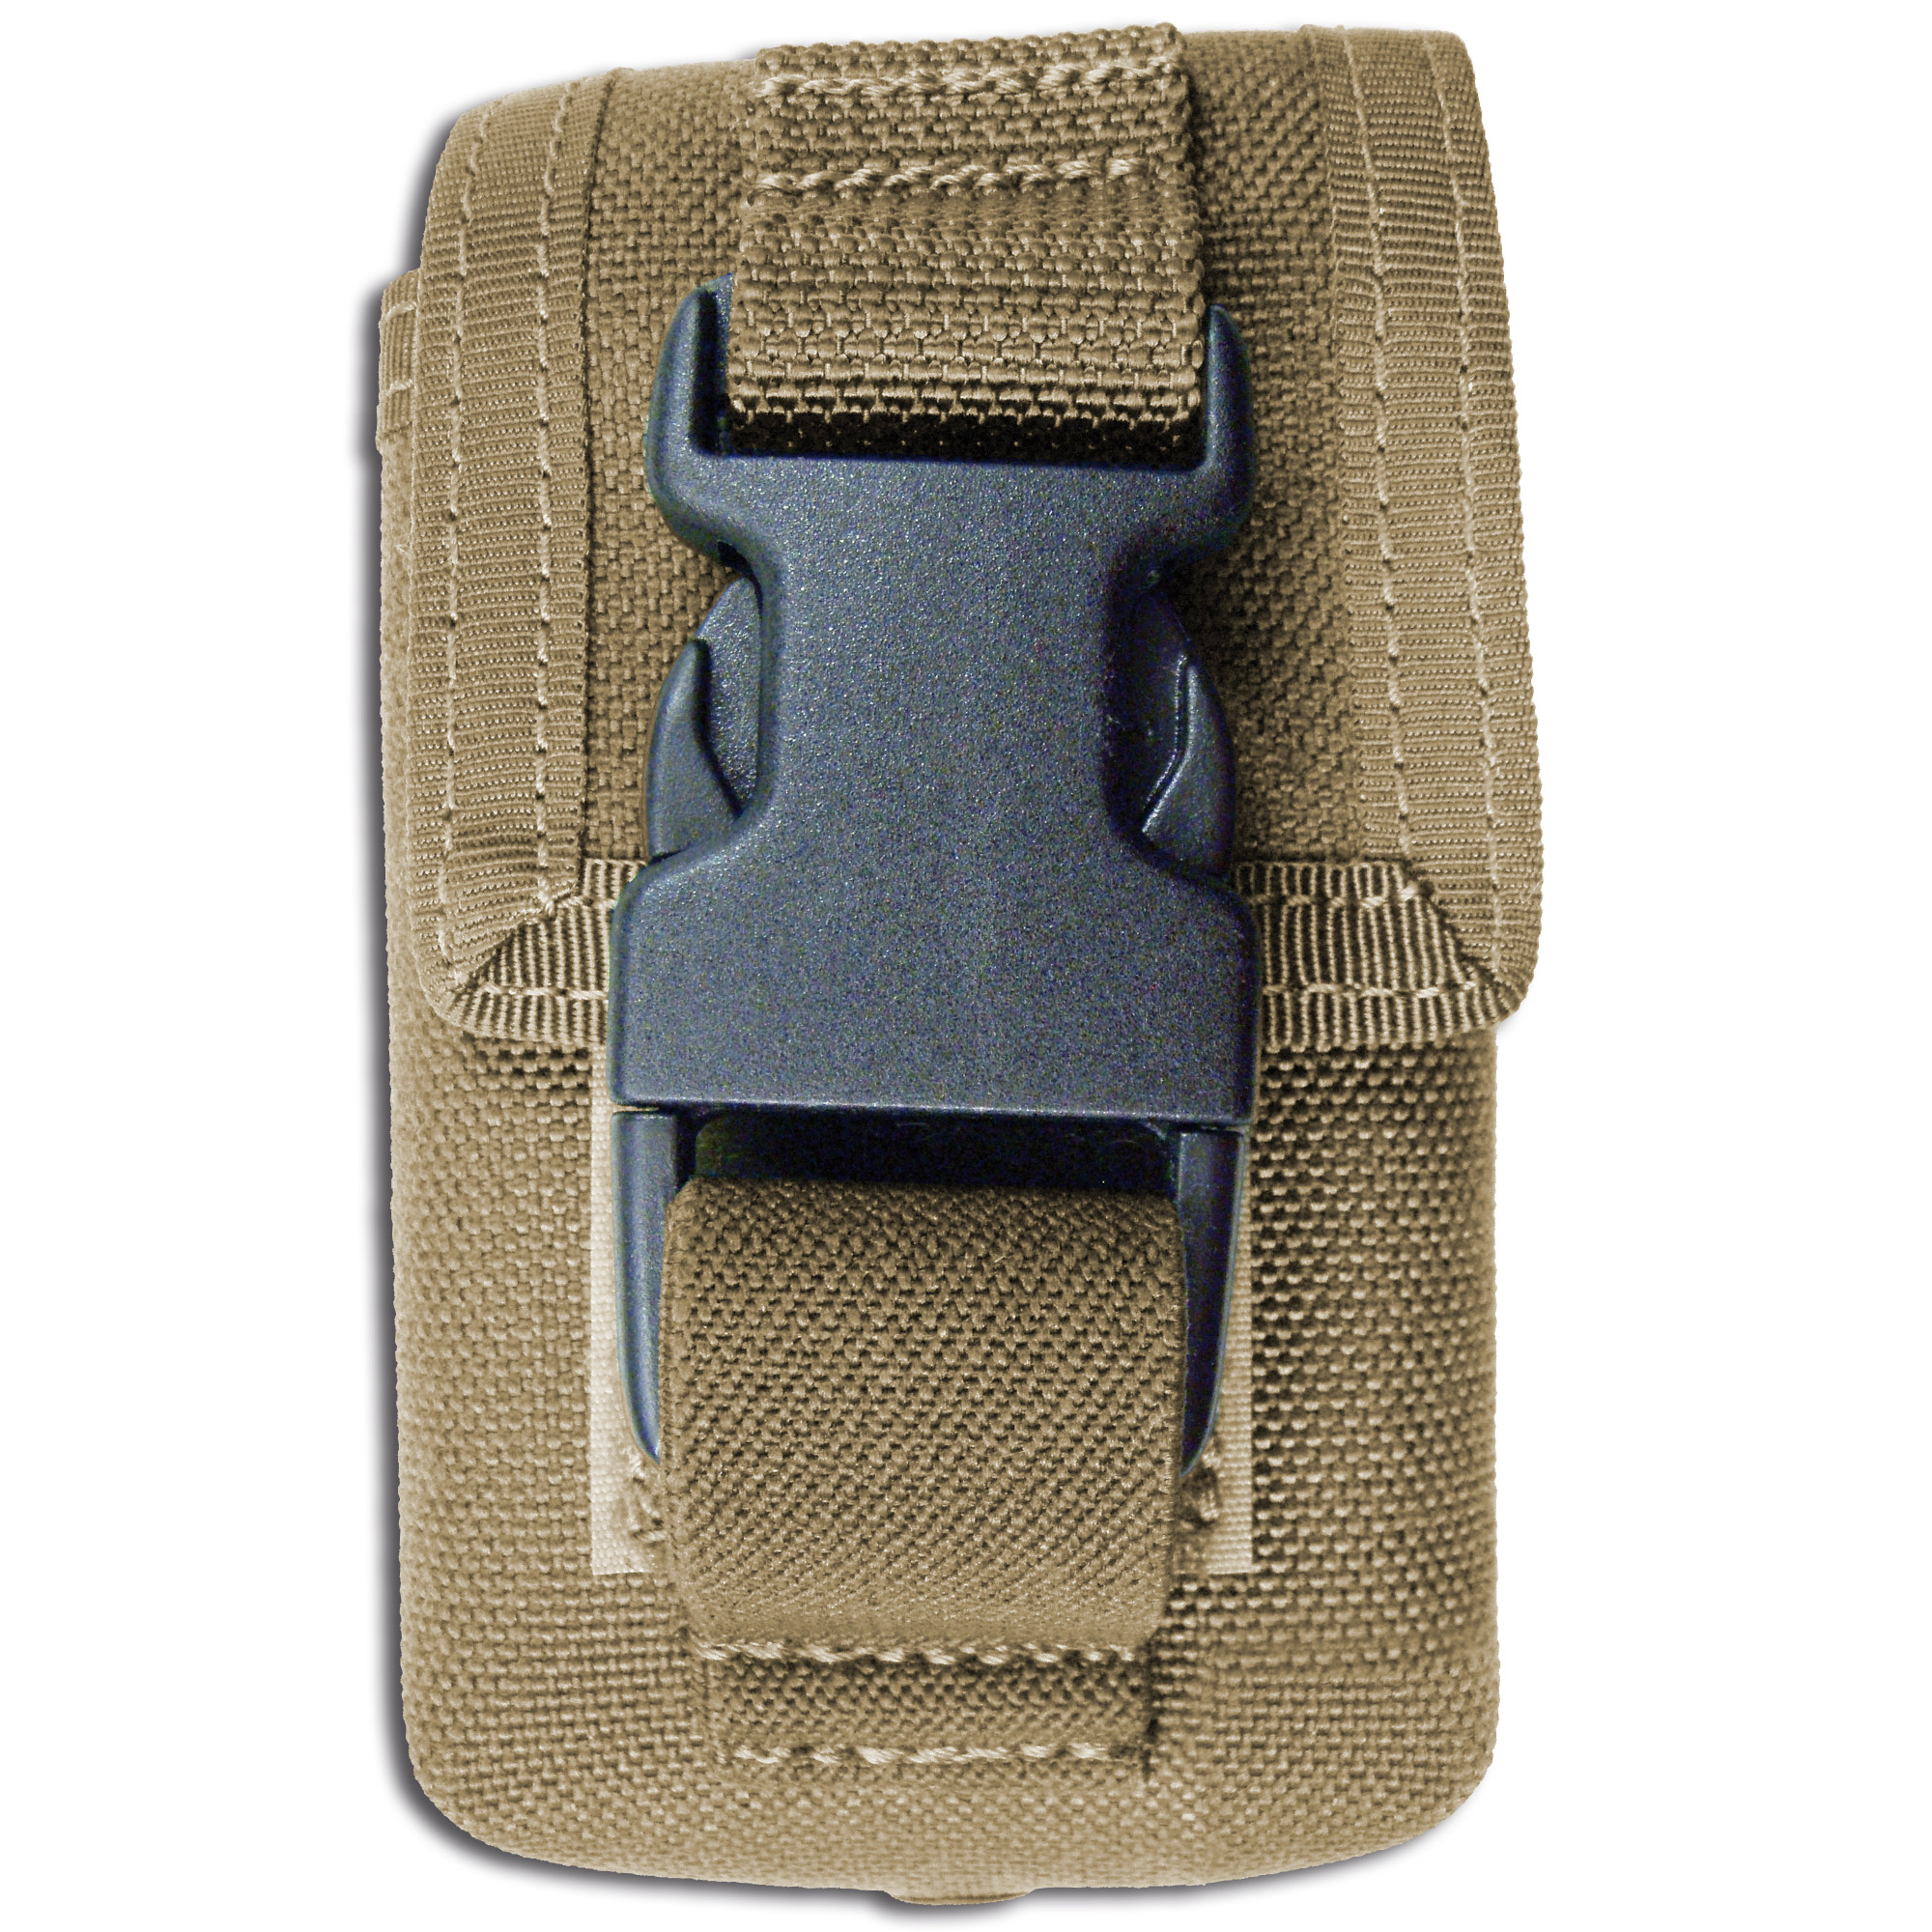 Tasca GPS/Bussola/LED strobo, Maxpedition, kaki